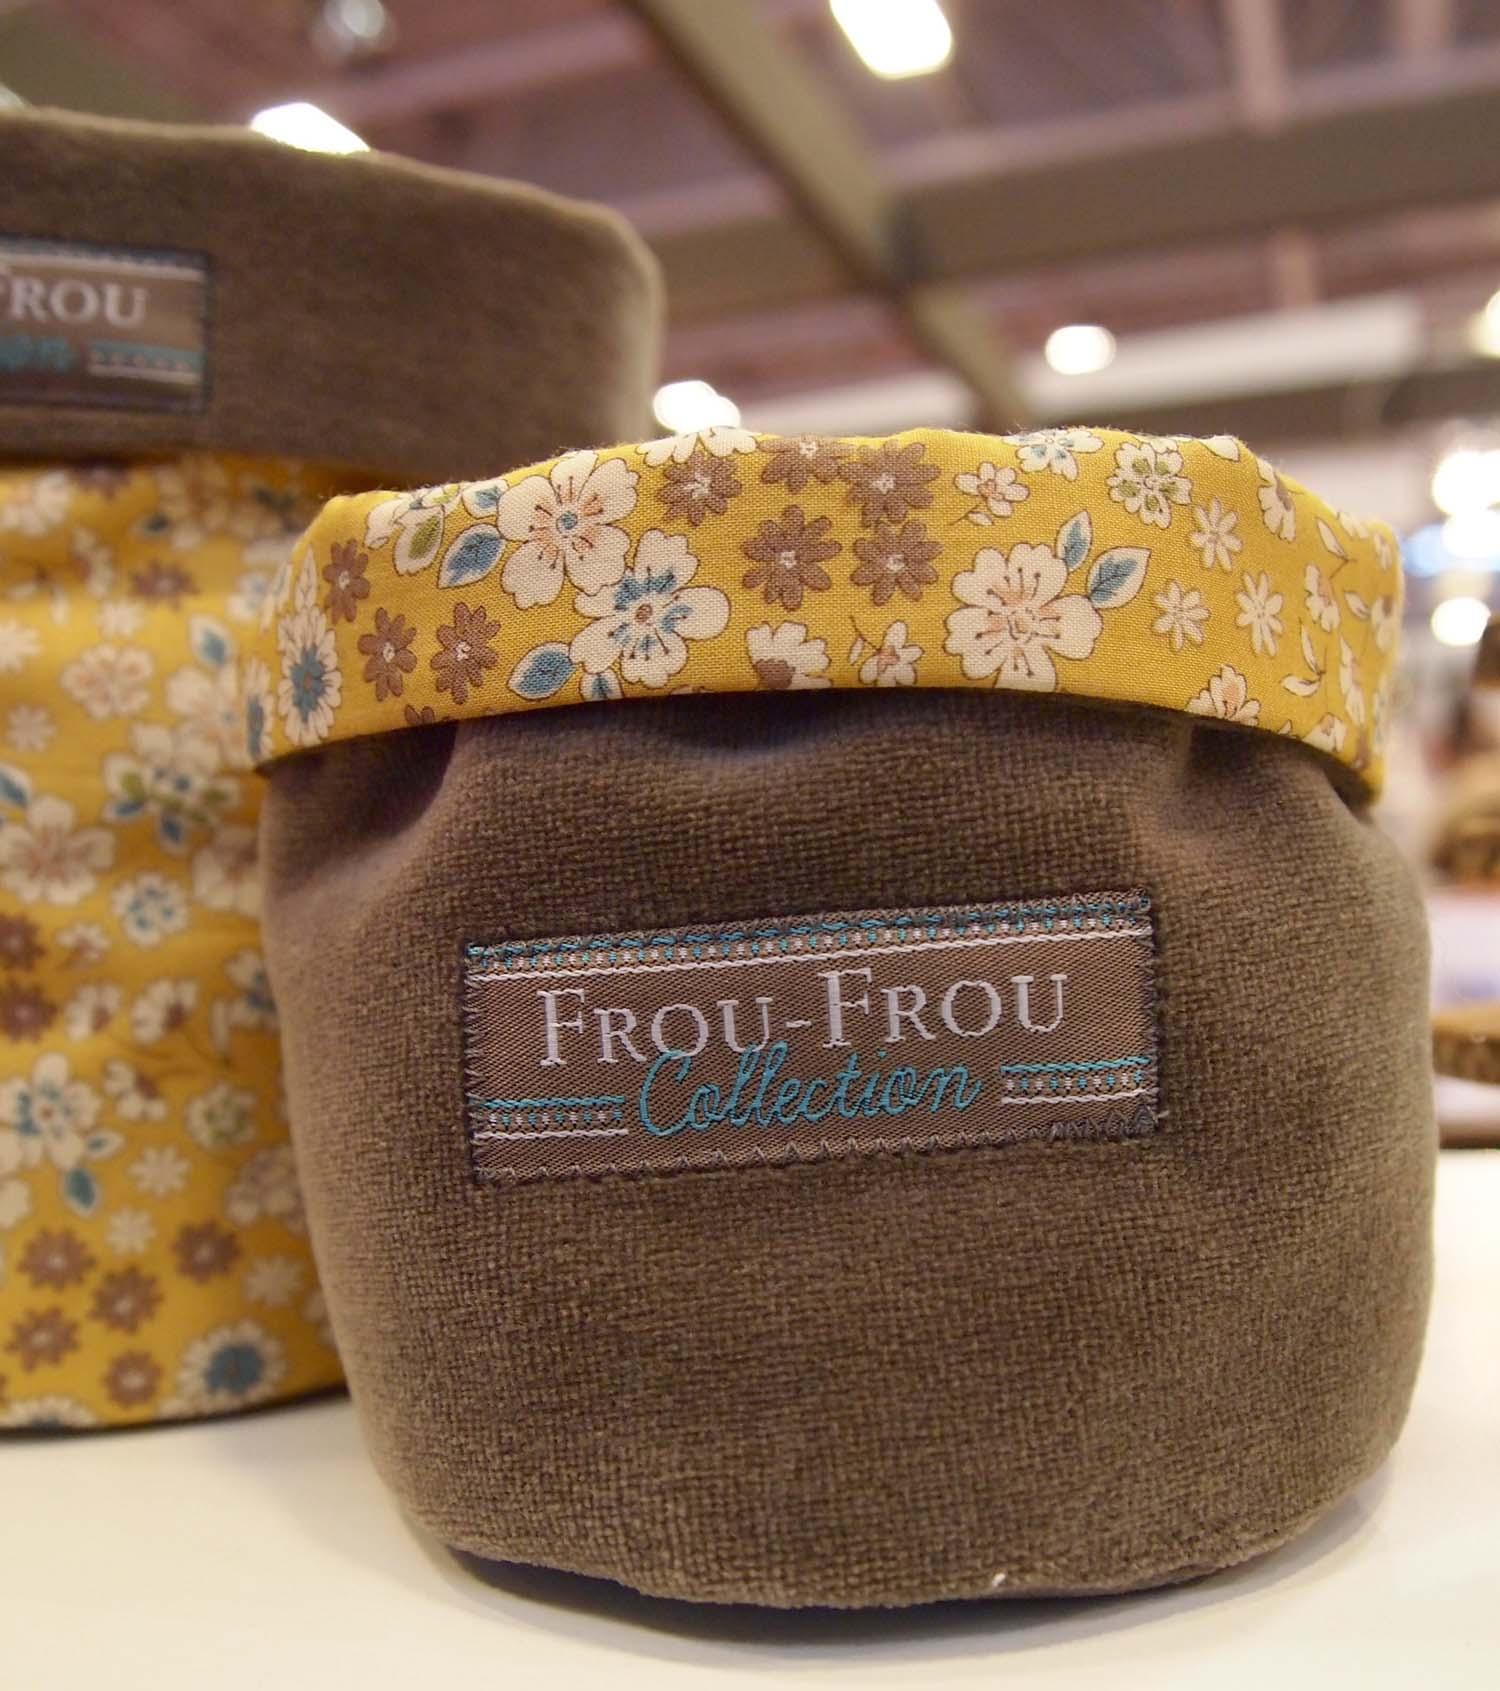 Frou-Frou au salon CSF